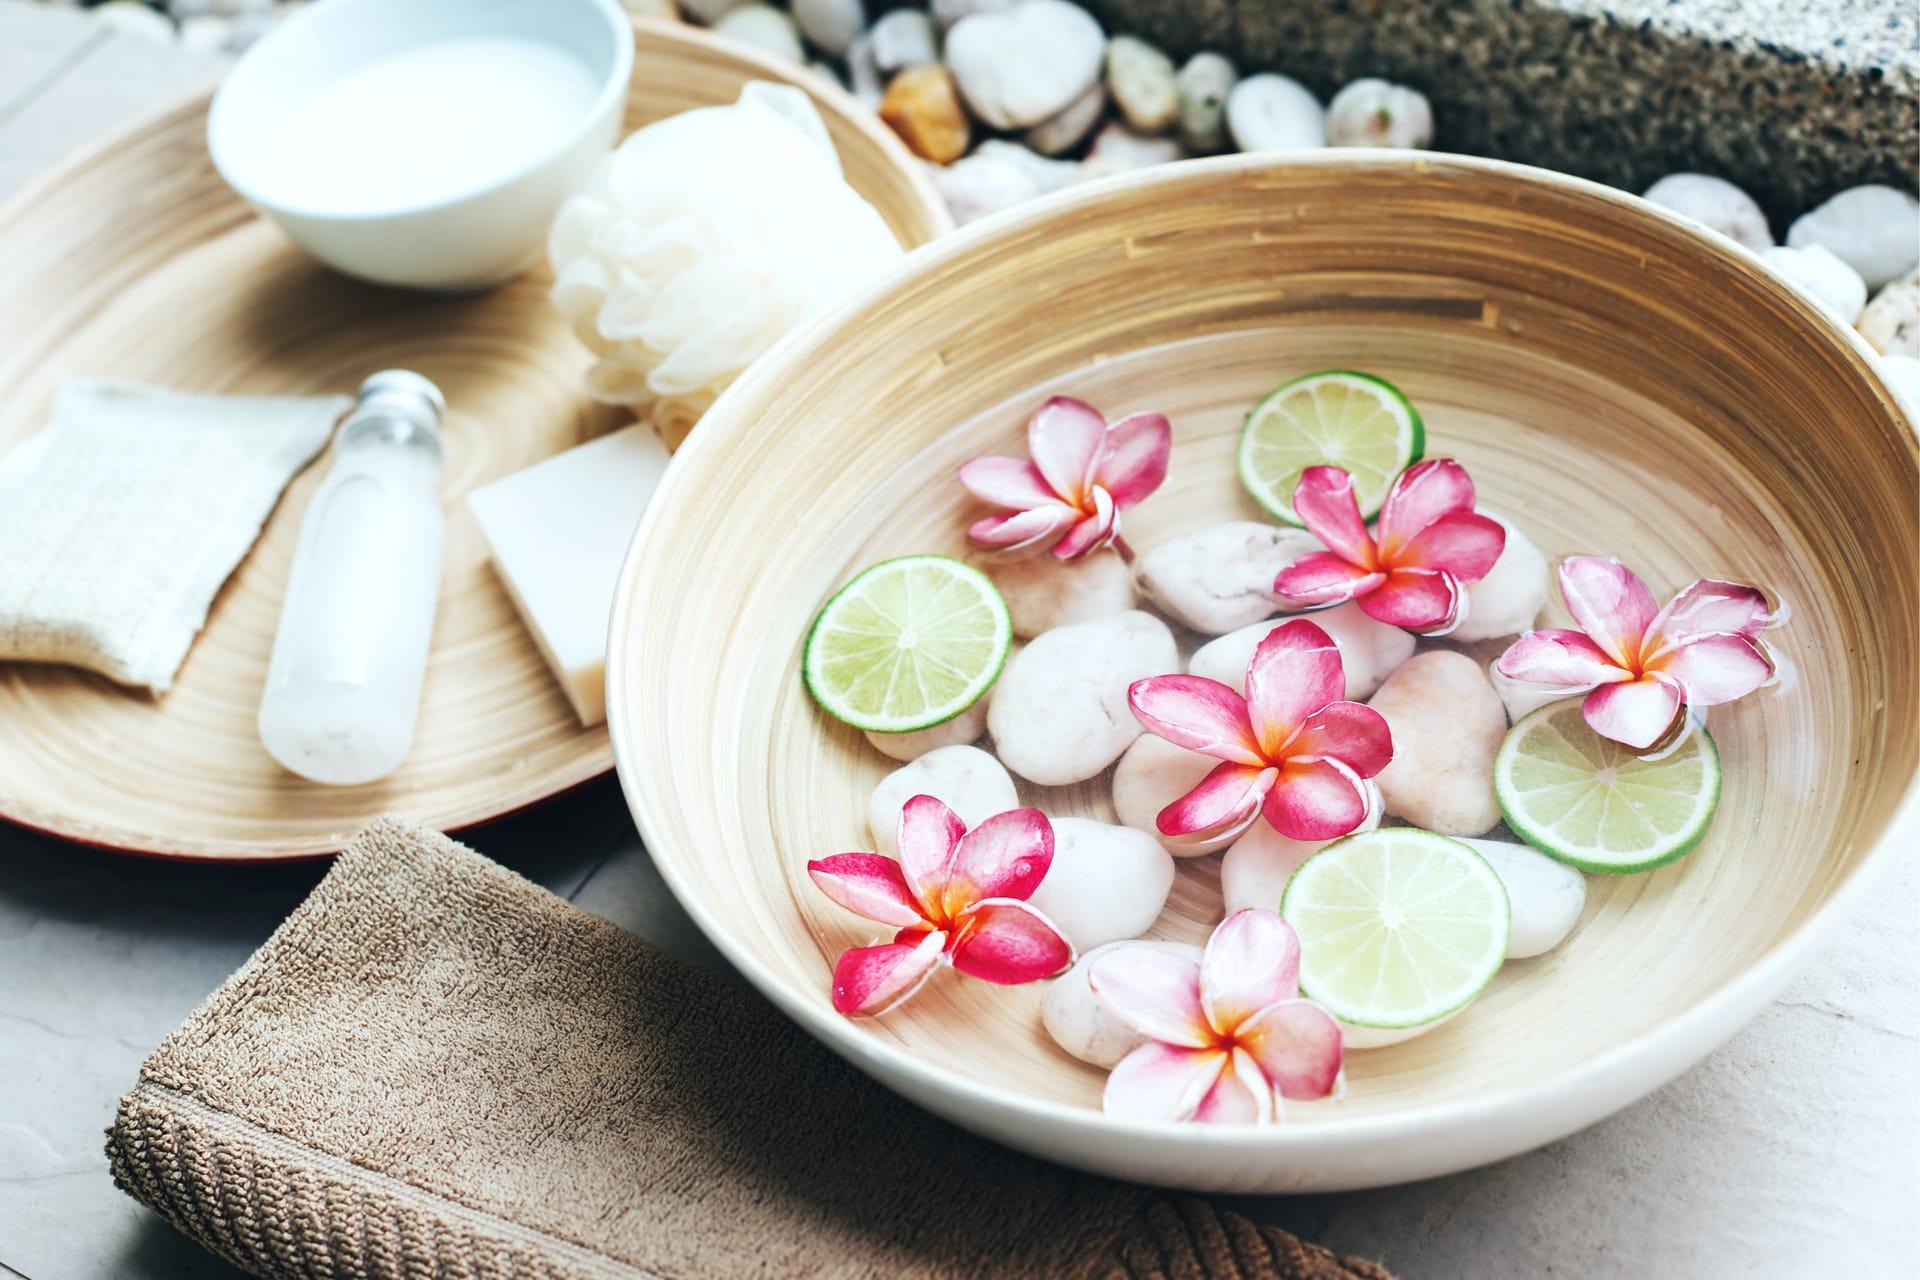 polished day spa